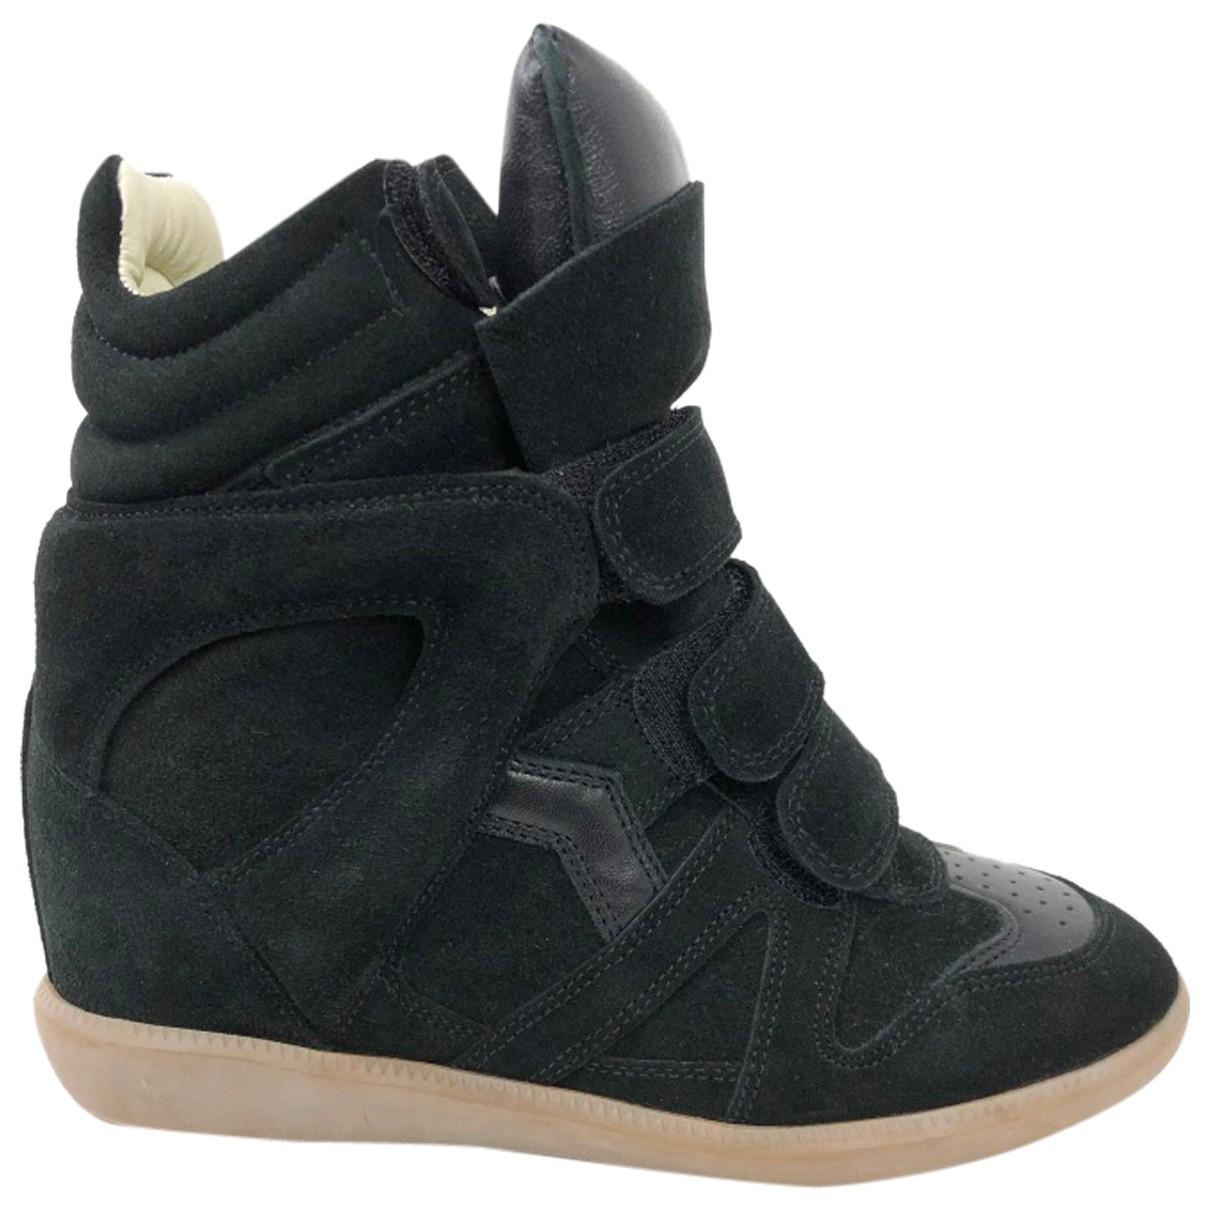 Isabel Marant Etoile \N Sneakers in  Schwarz Veloursleder